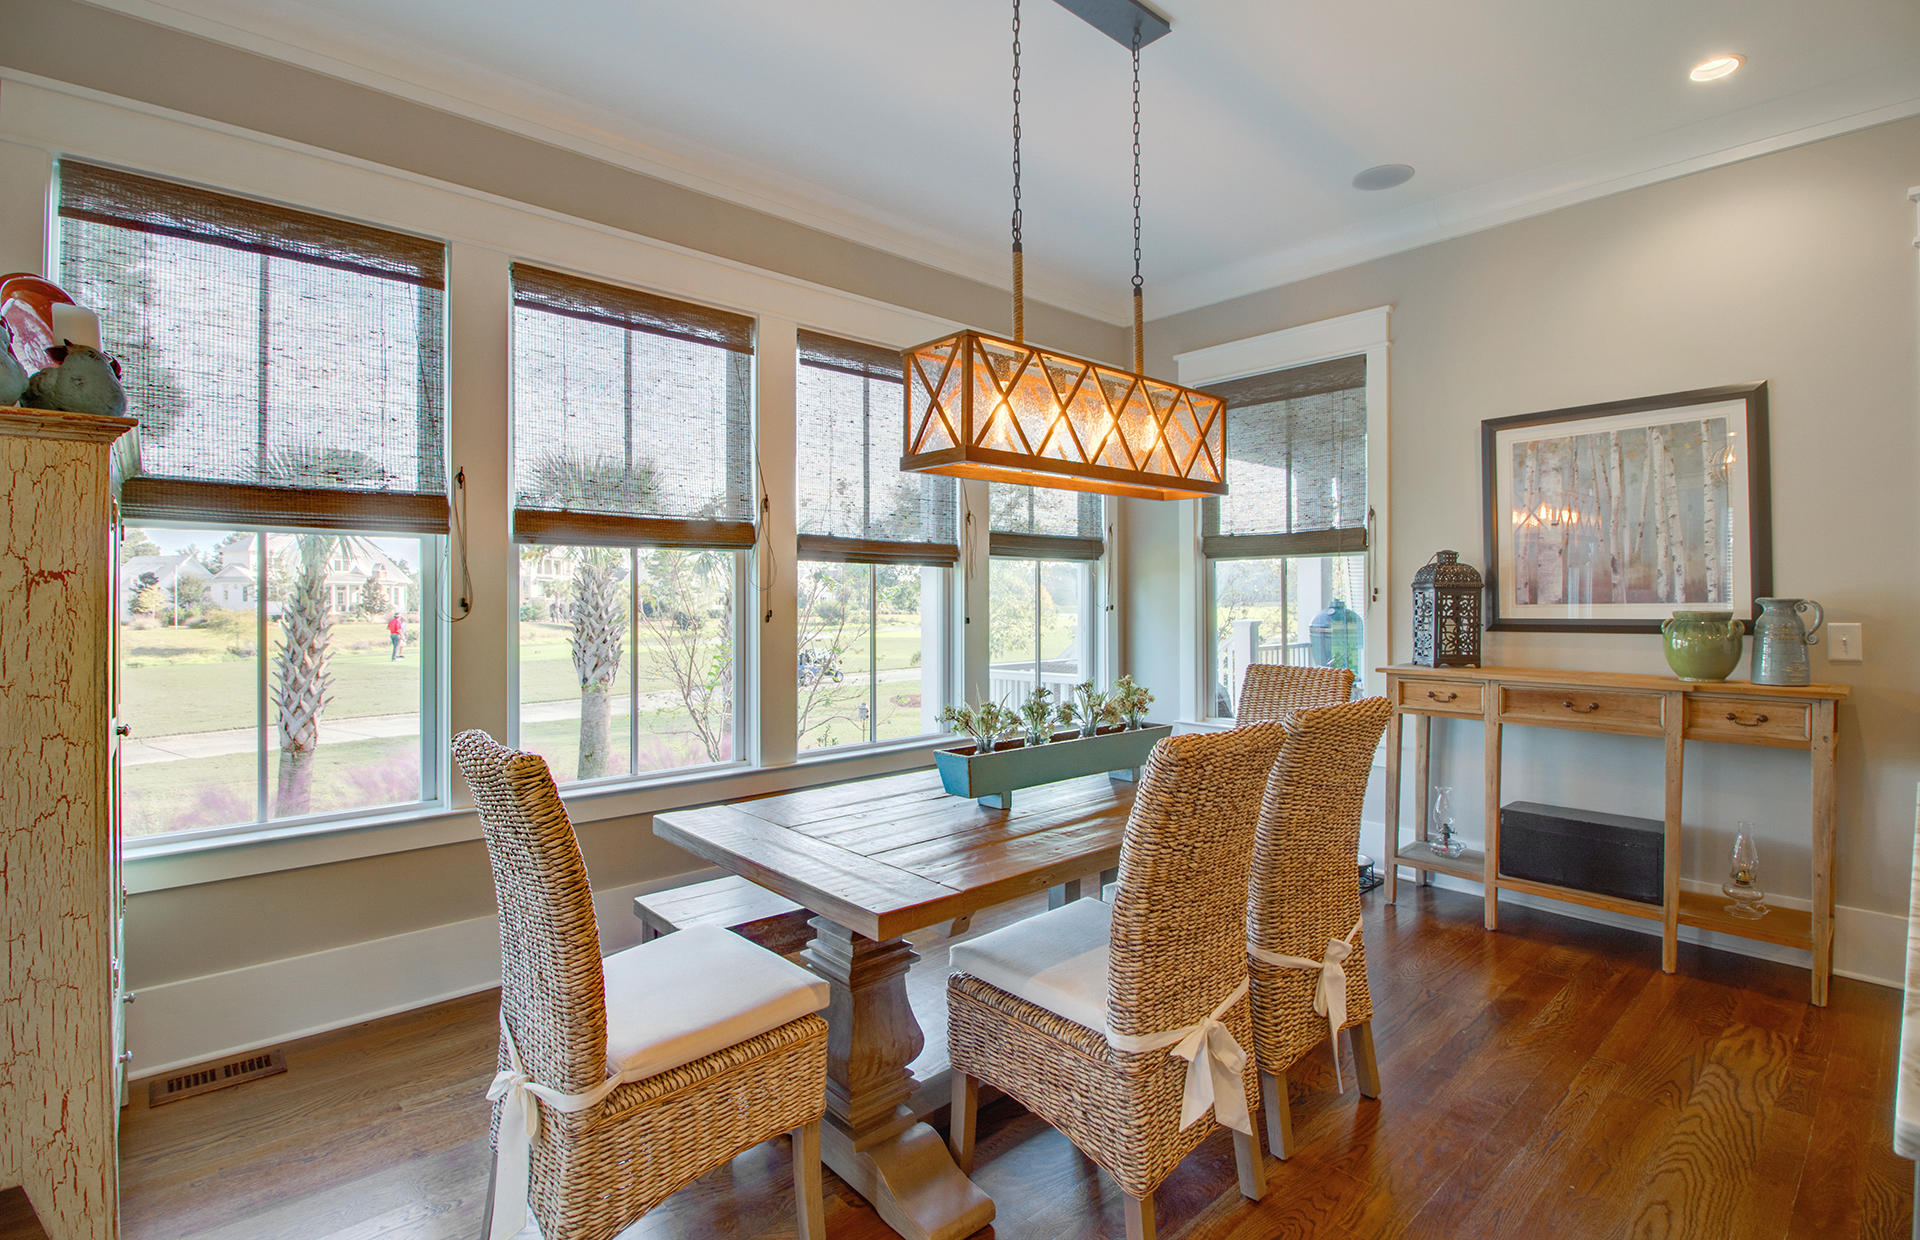 Daniel Island Park Homes For Sale - 117 Brailsford, Charleston, SC - 3